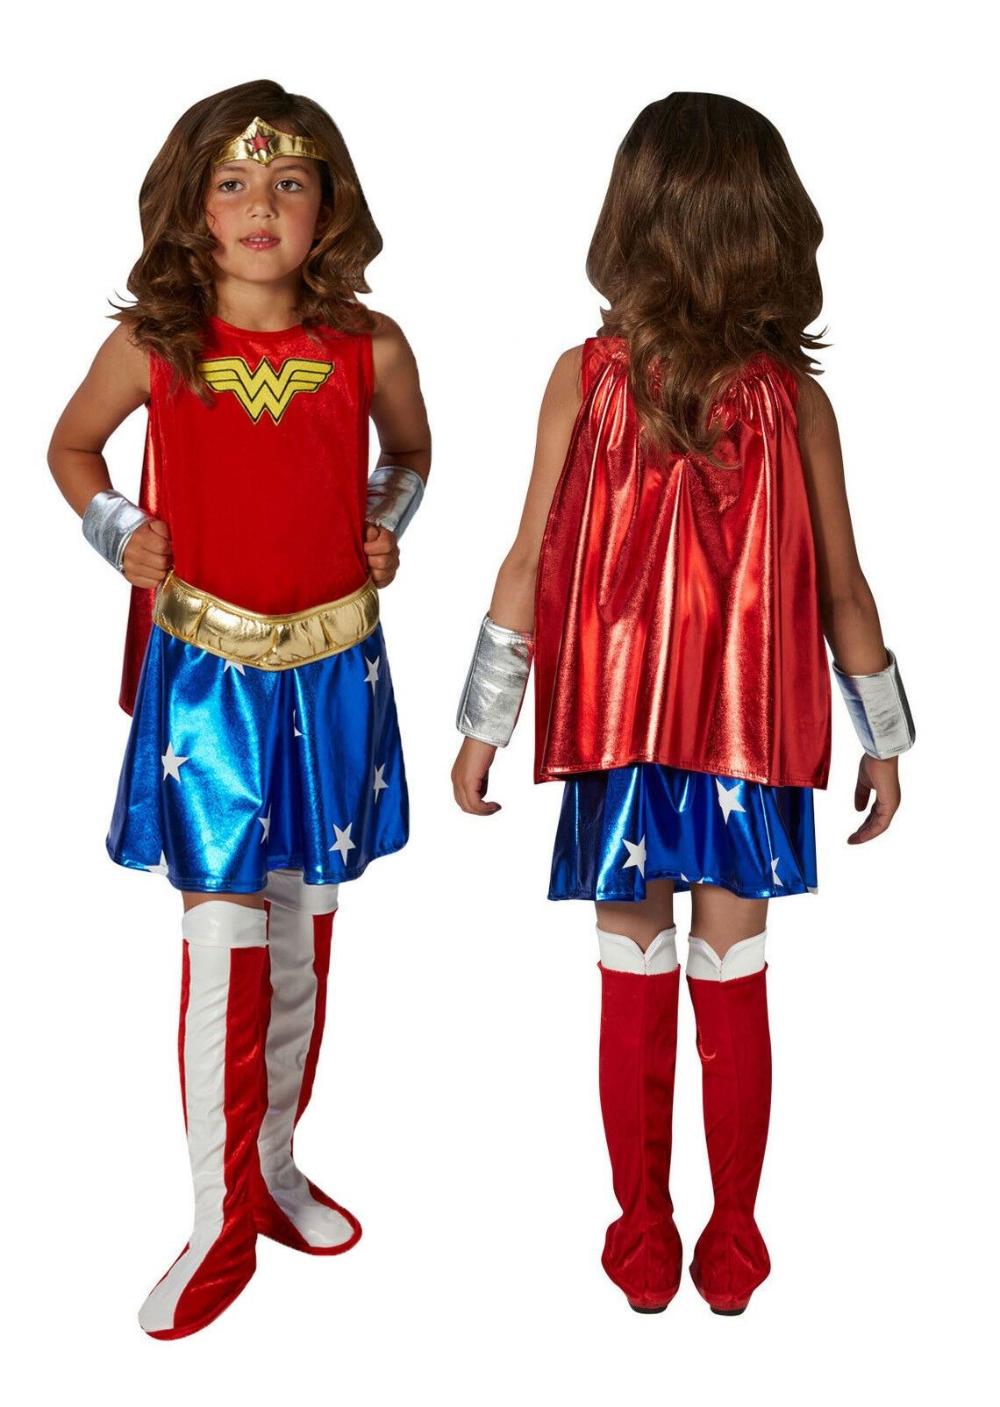 Girls Supergirl Superwoman Superhero Book Day Week Fancy Dress Costume Outfit